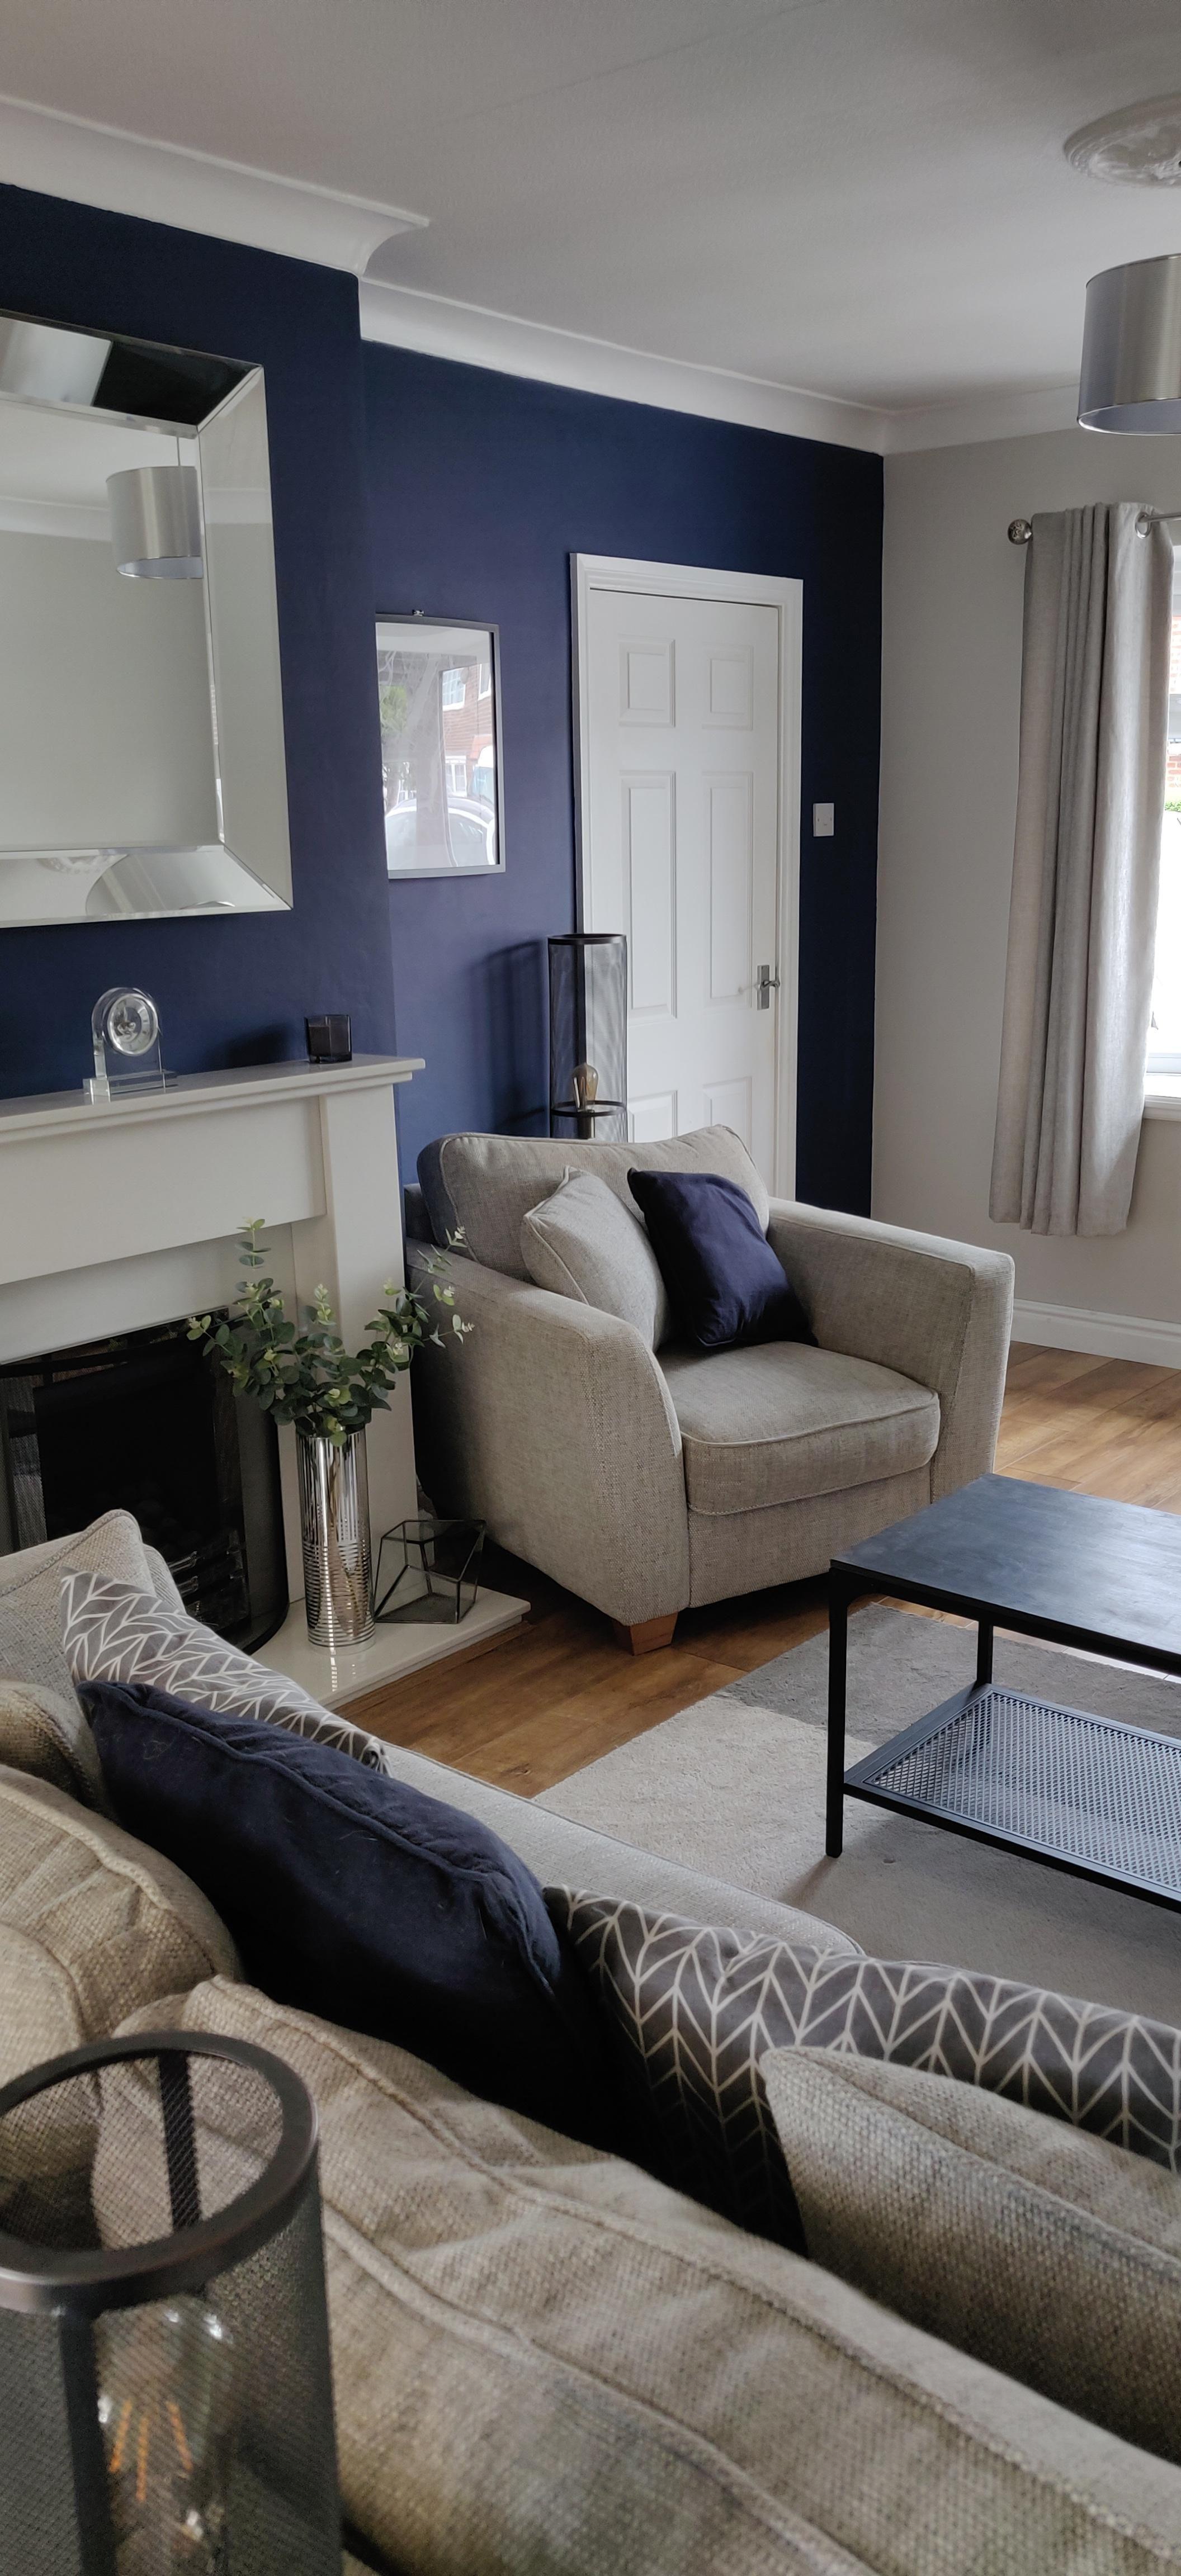 Sapphire Salute Preston Uk Amateurroomporn In 2020 Blue Living Room Decor Blue Living Room Color Navy Living Room Decor